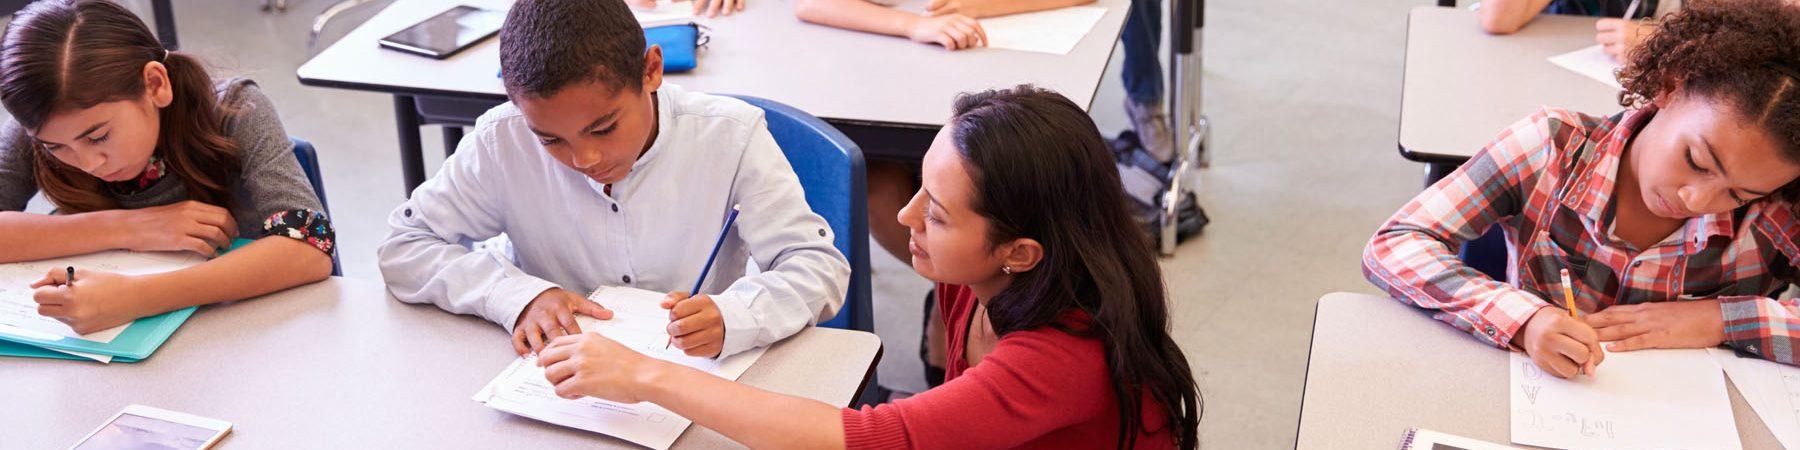 Educating Bilingual Learners Online Graduate Certificate - Bilingual education teacher helping ESL student.